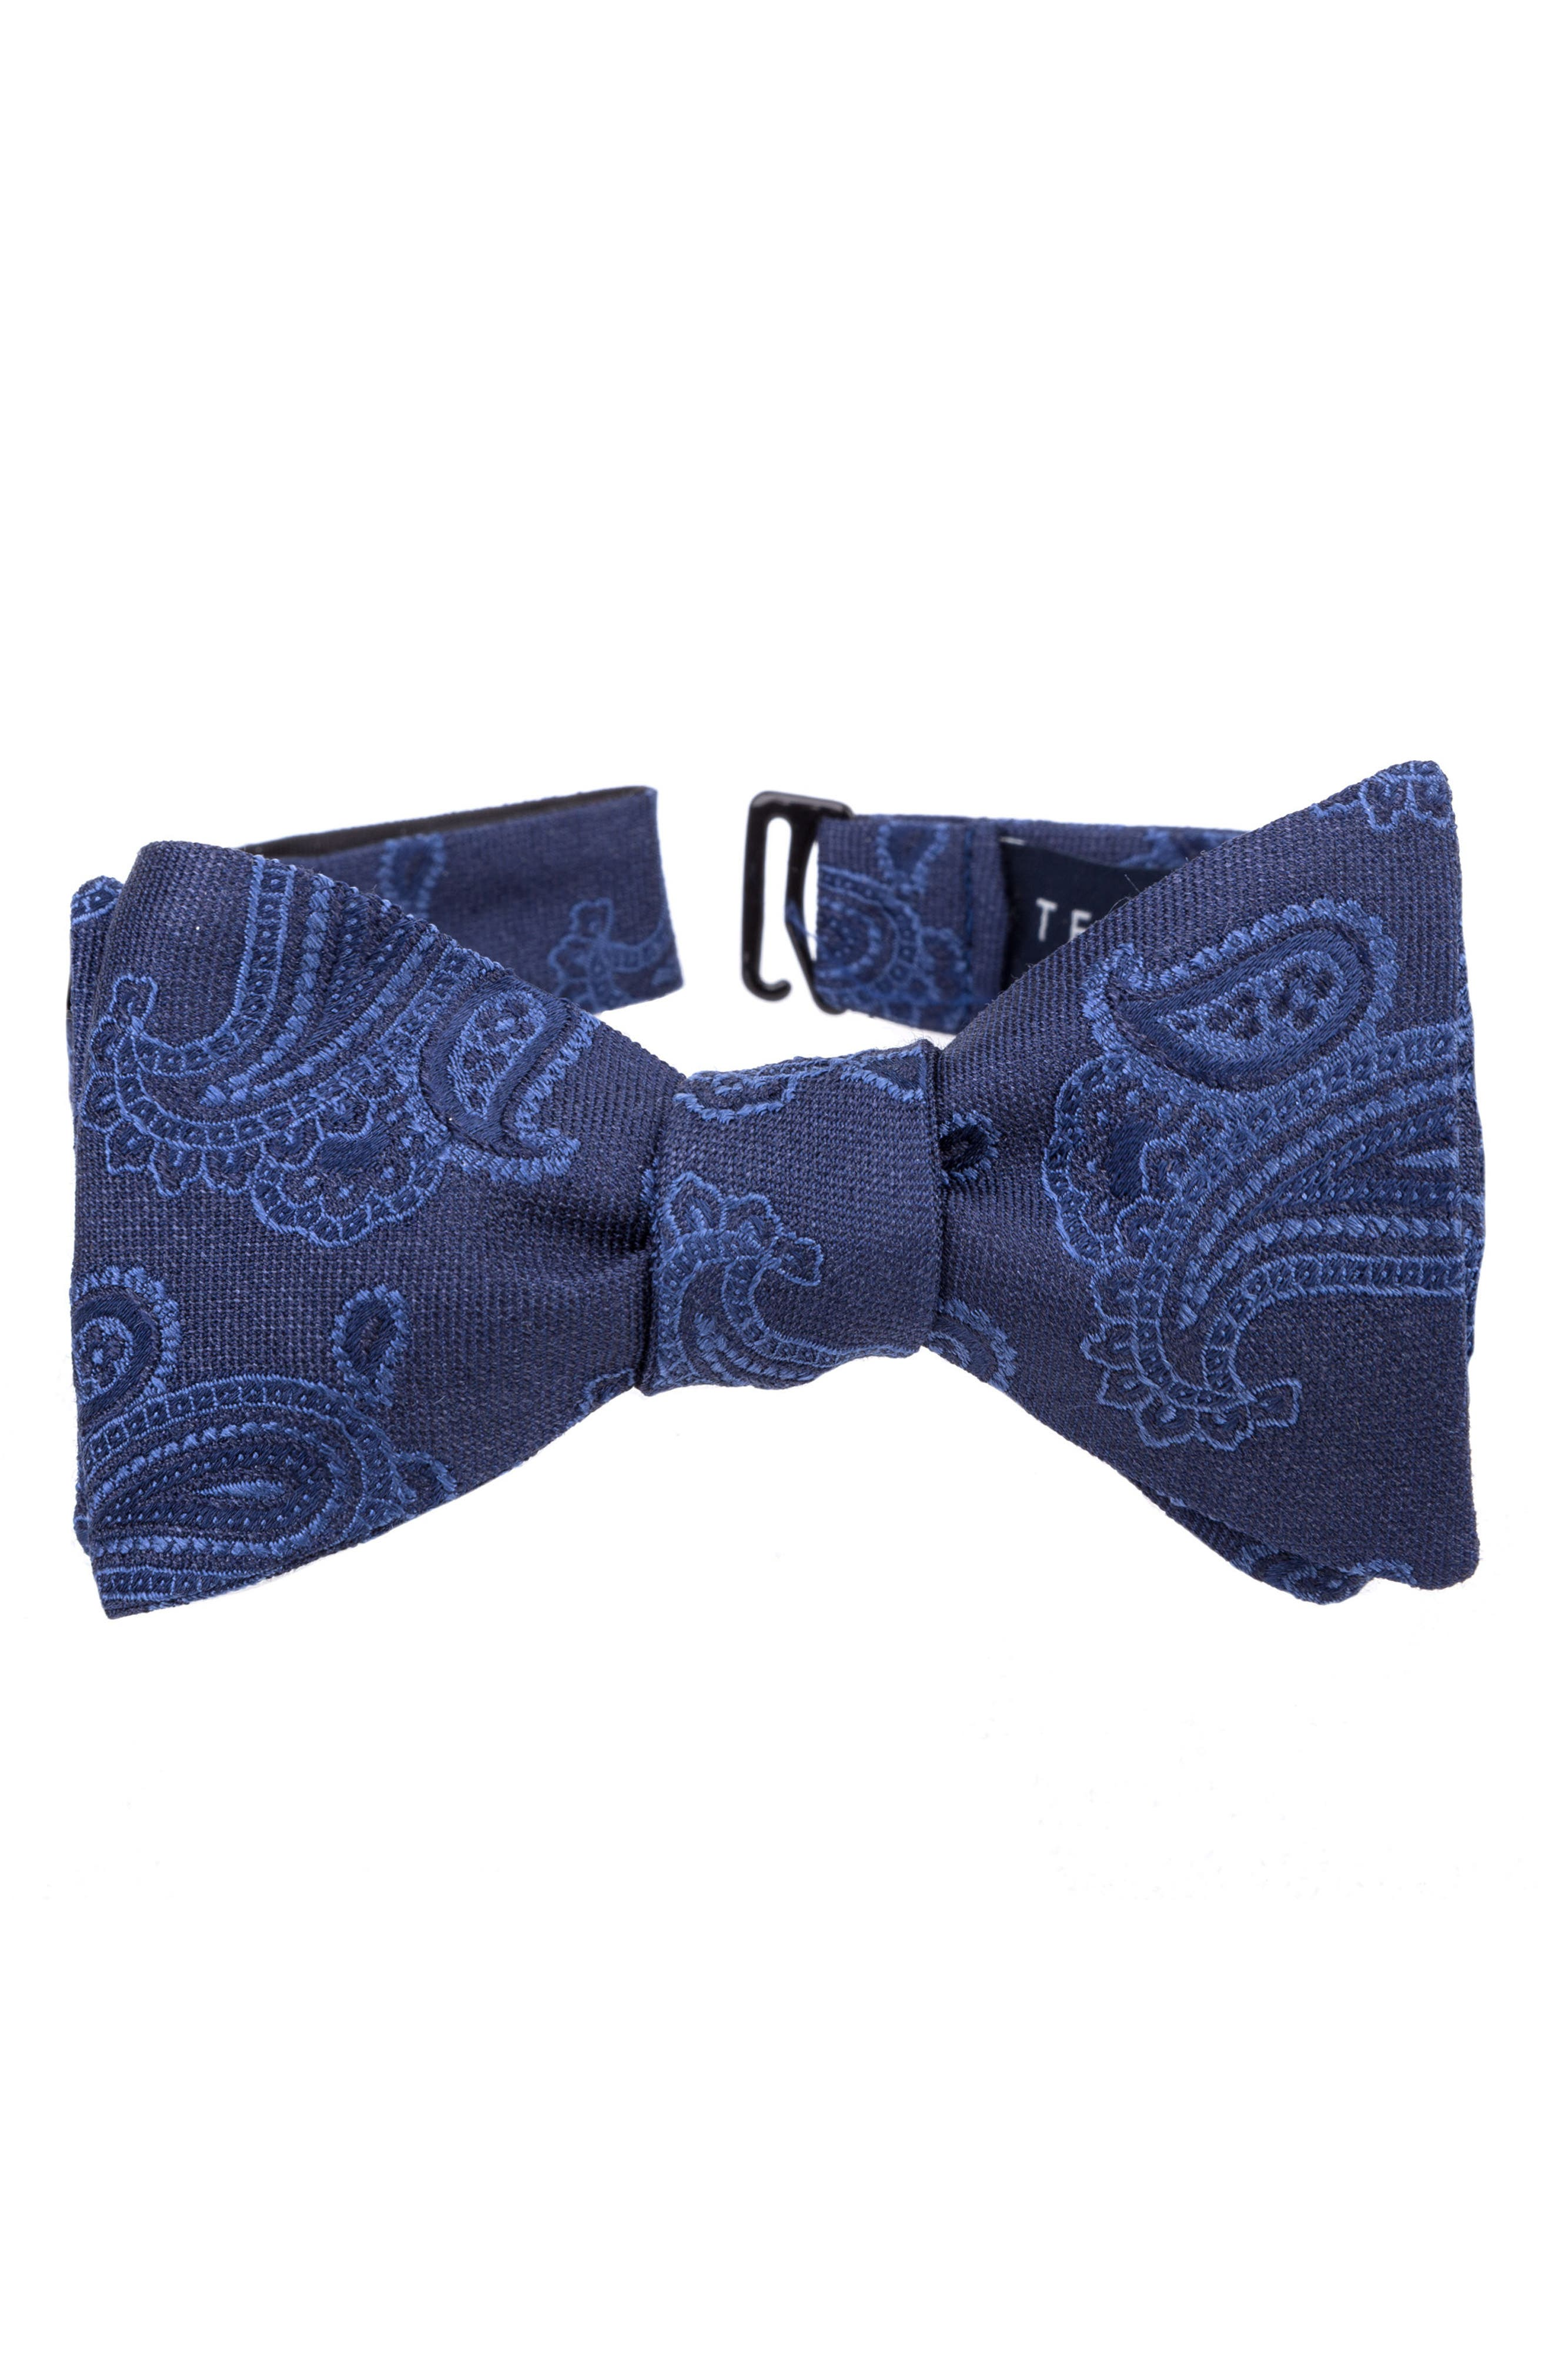 Indigo Wardrobe Silk Bow Tie,                             Main thumbnail 1, color,                             Sapphire